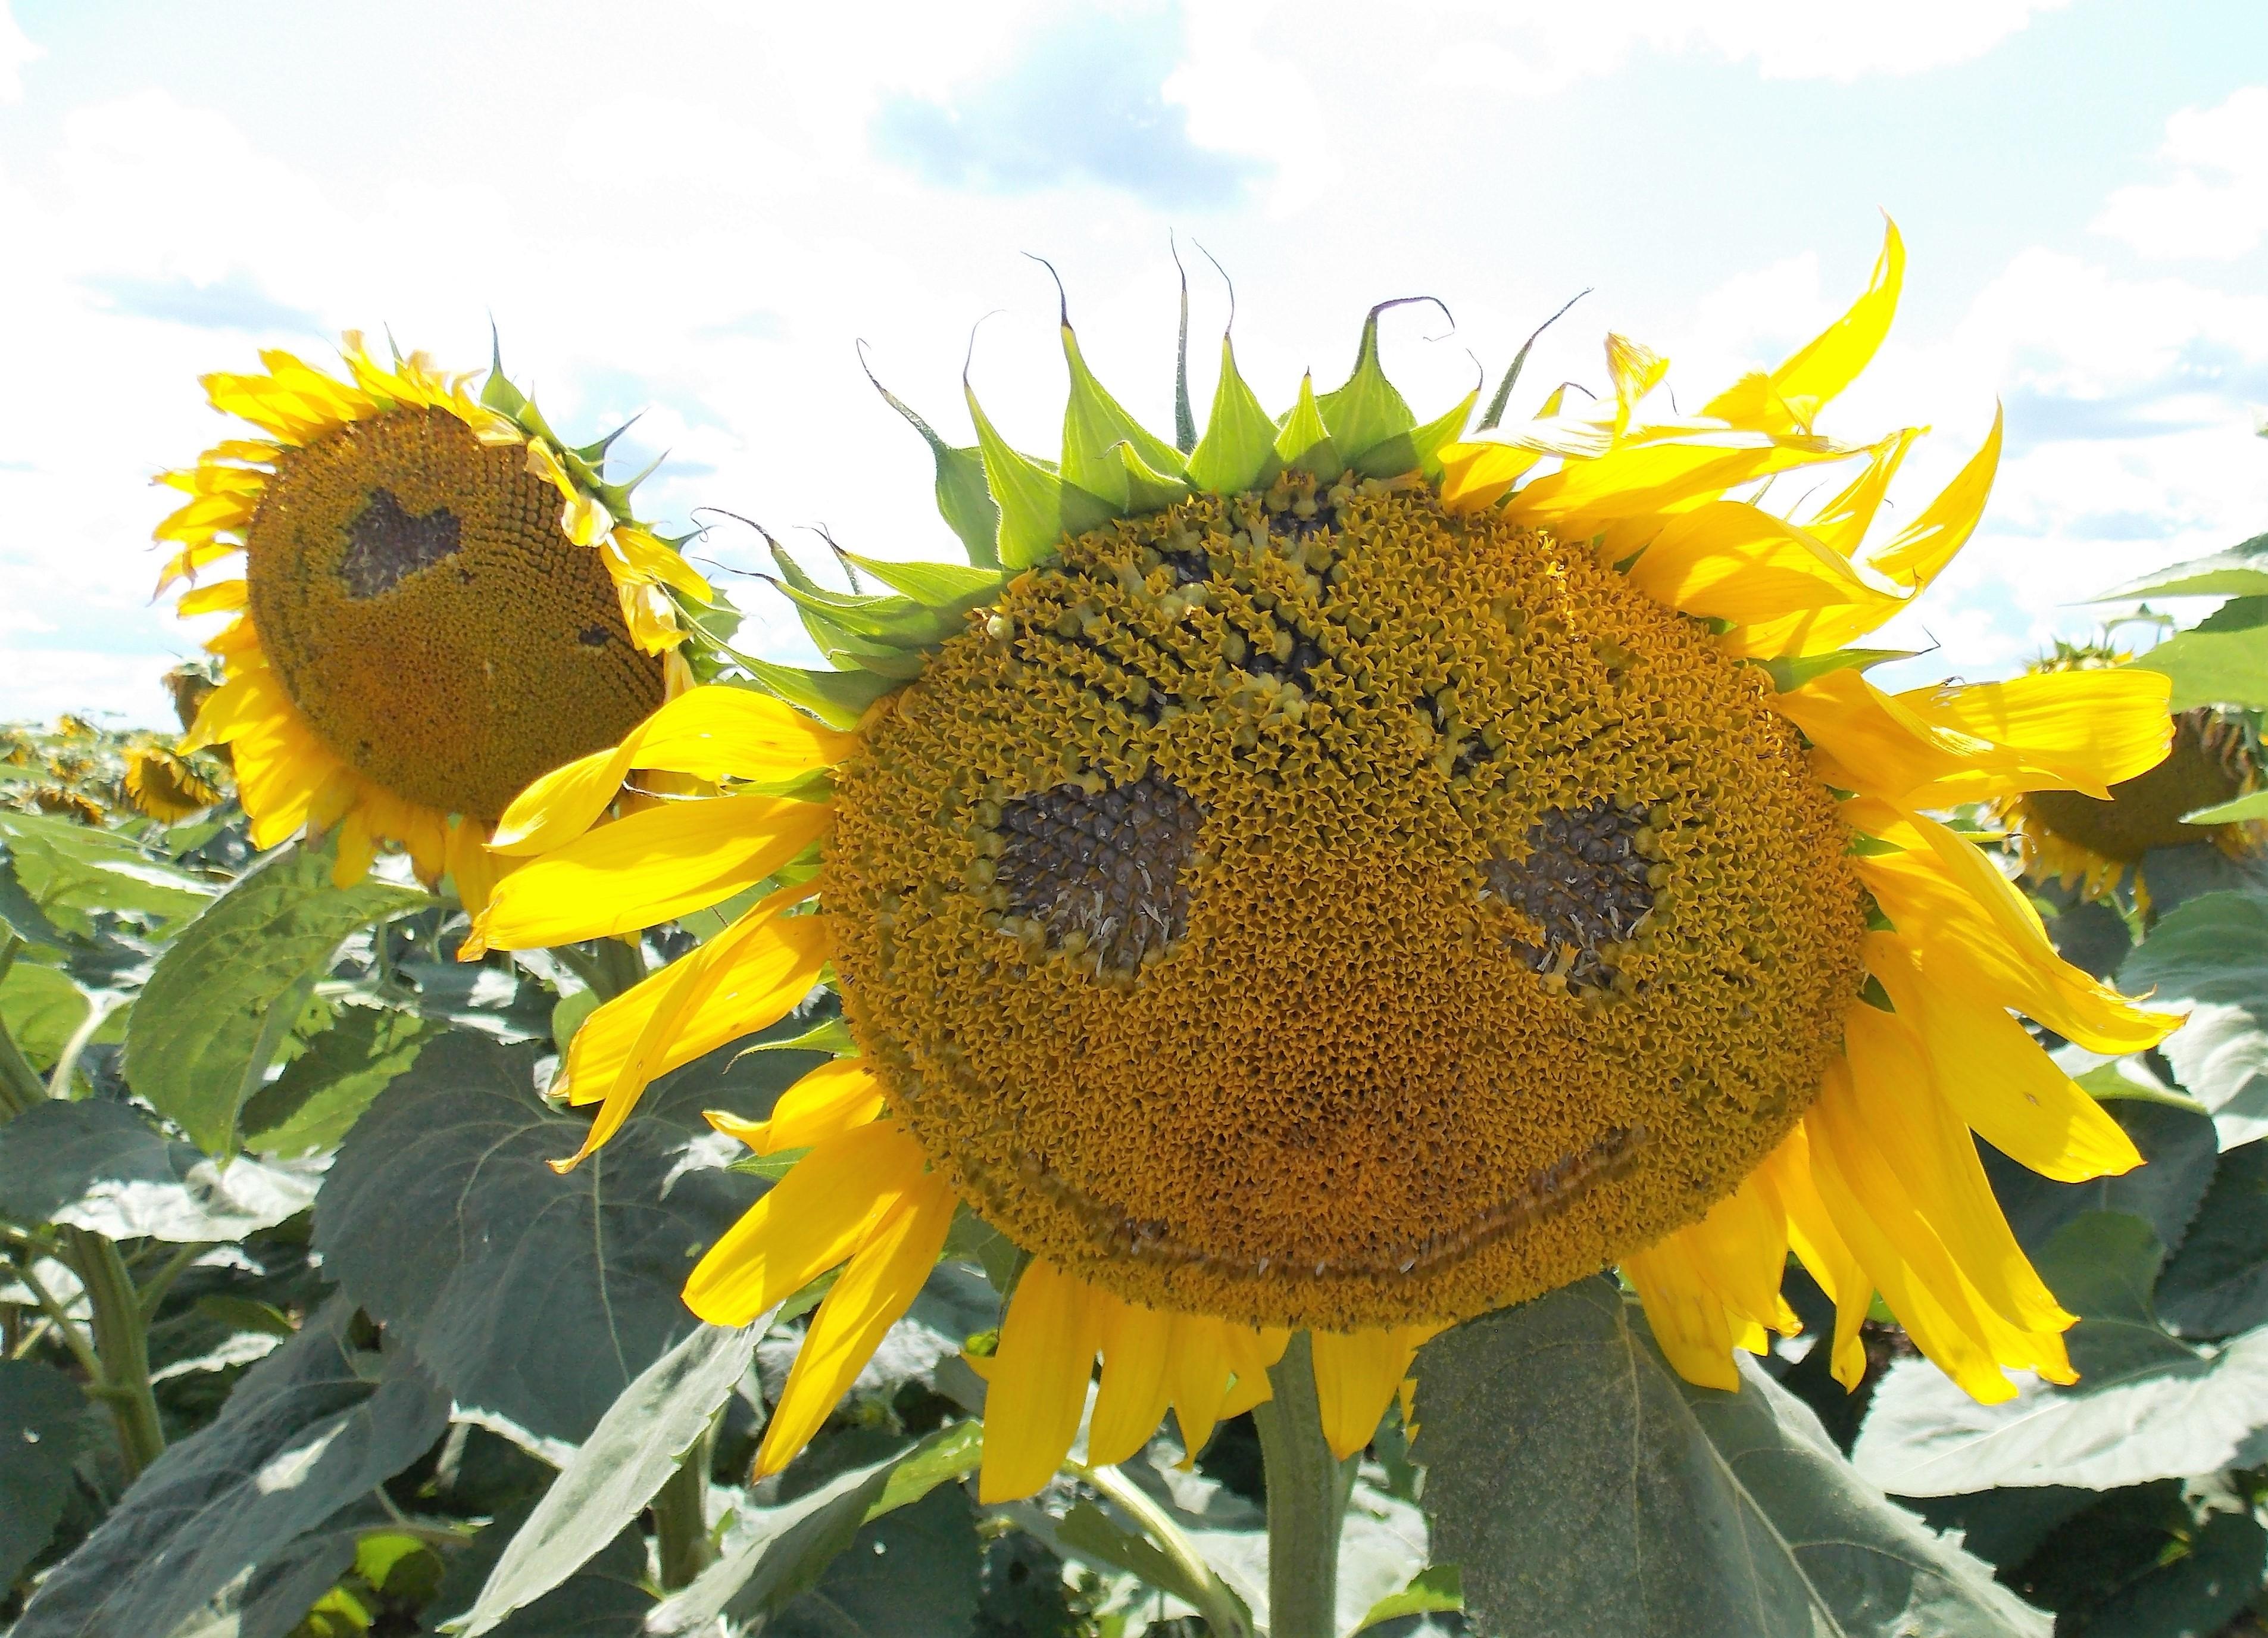 Summer Field Trip Sunflower Festival Life As A Field Trip